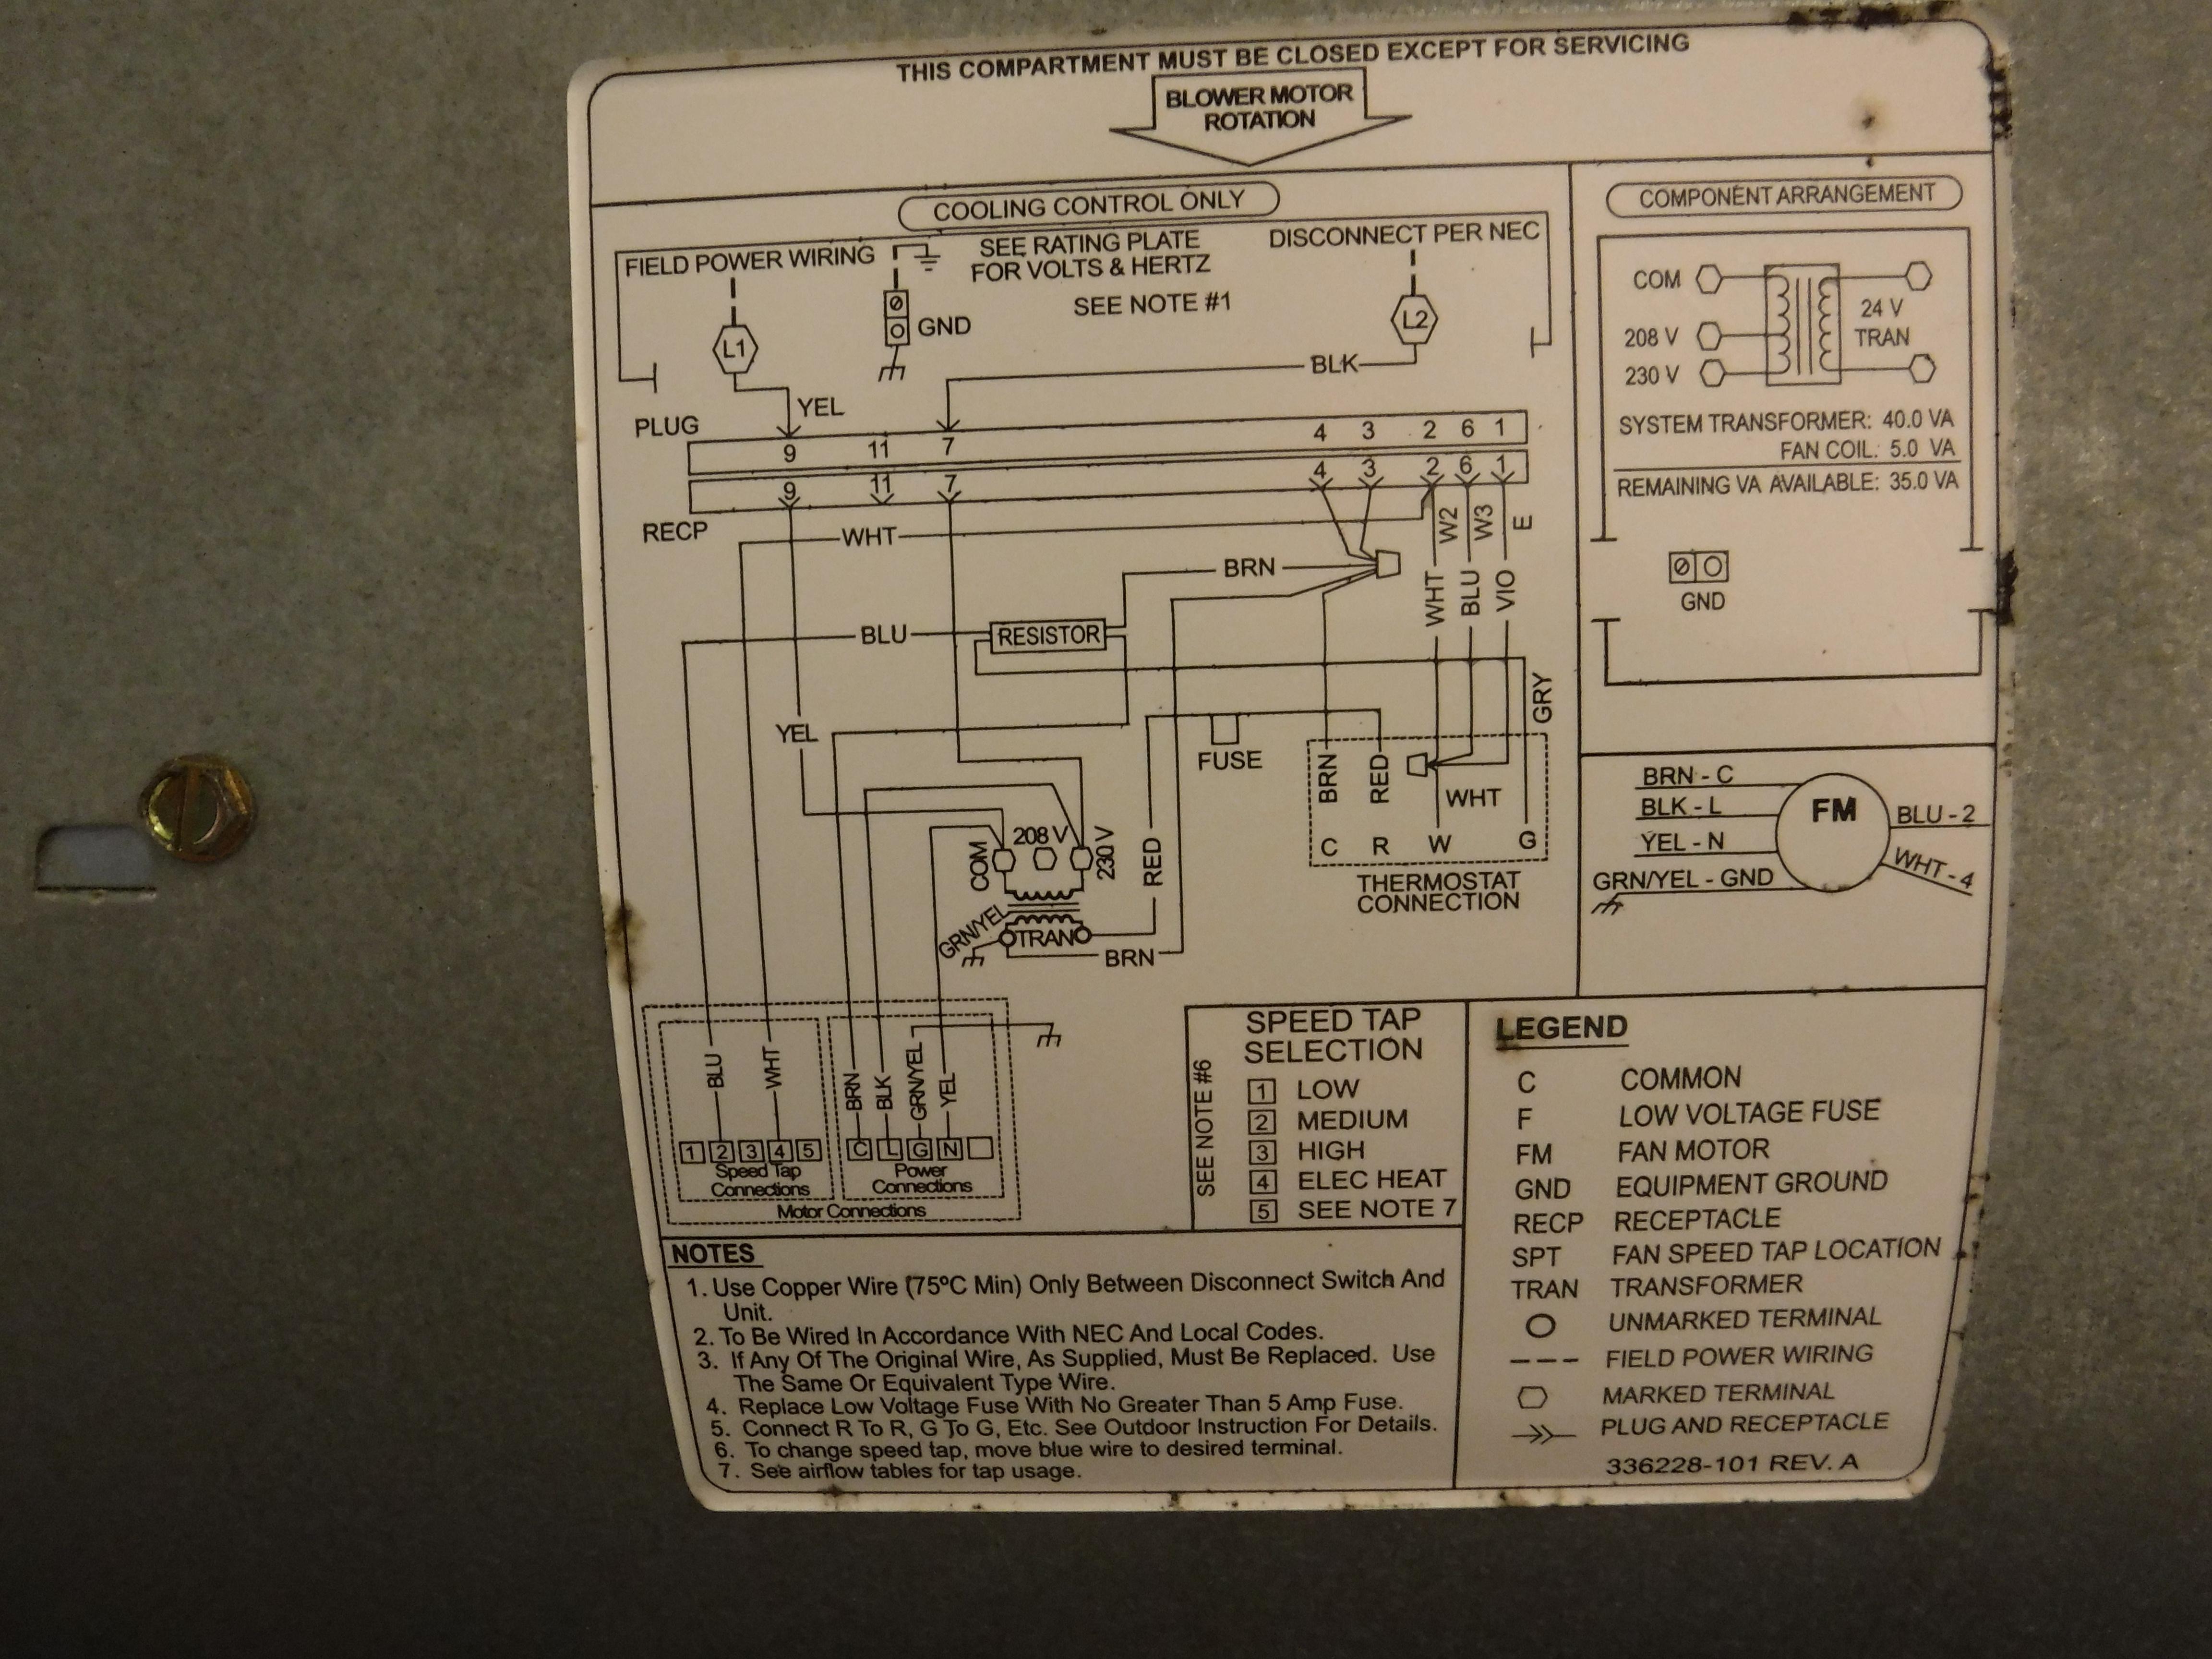 My Carrier Model Fx4dnf037 Blower Motor Will Not Shut Off